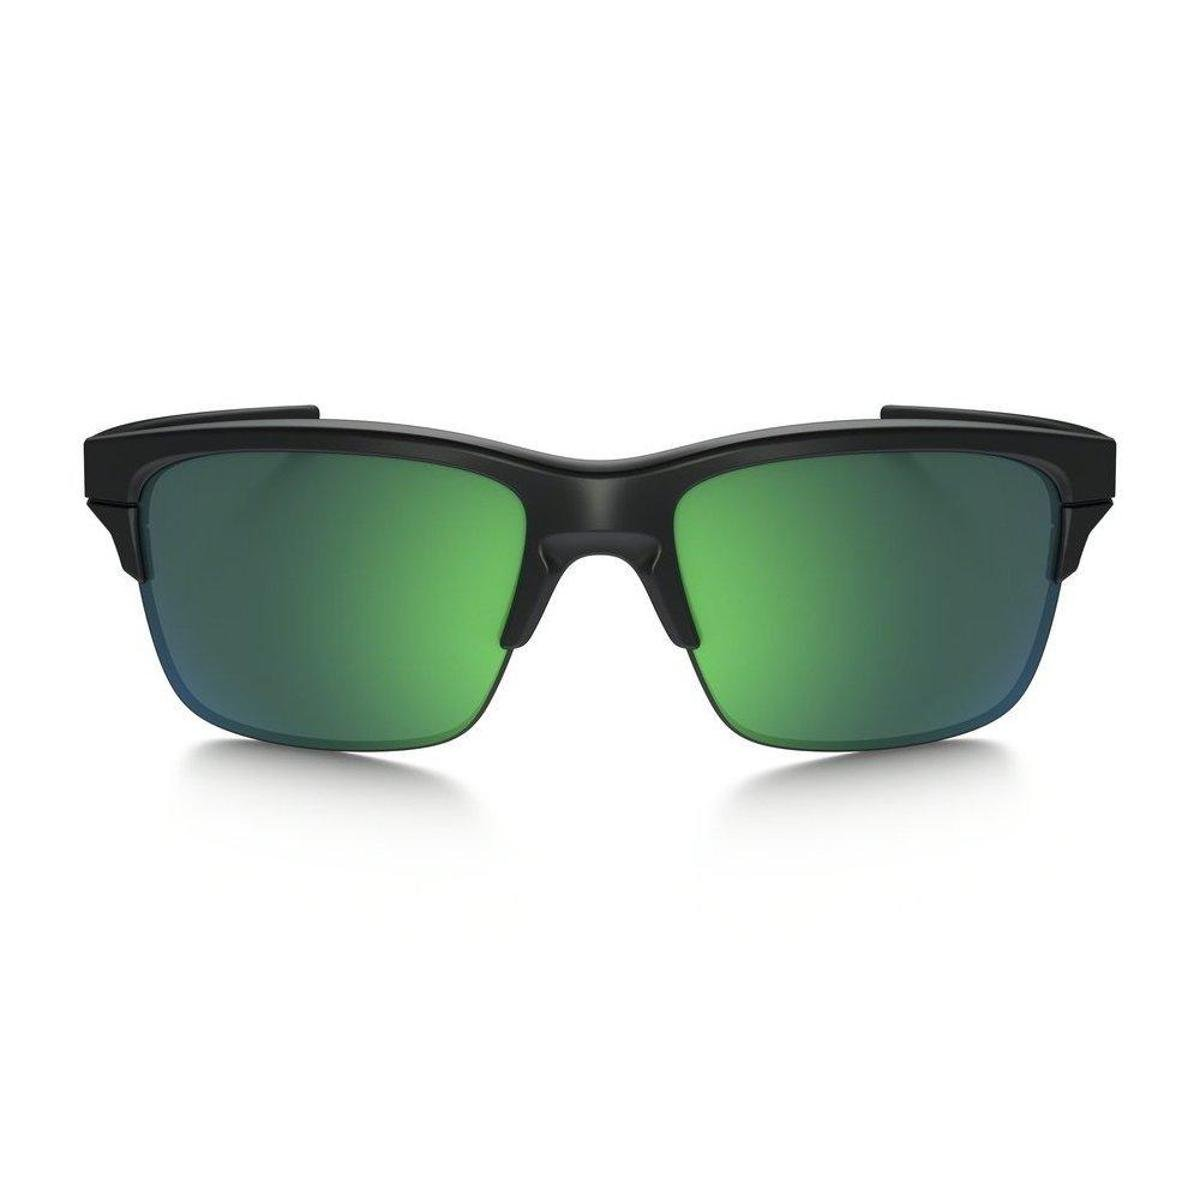 778f839a17d7e ÓCULOS OAKLEY THINLINK OO9316-09 - Verde - Compre Agora   Zattini